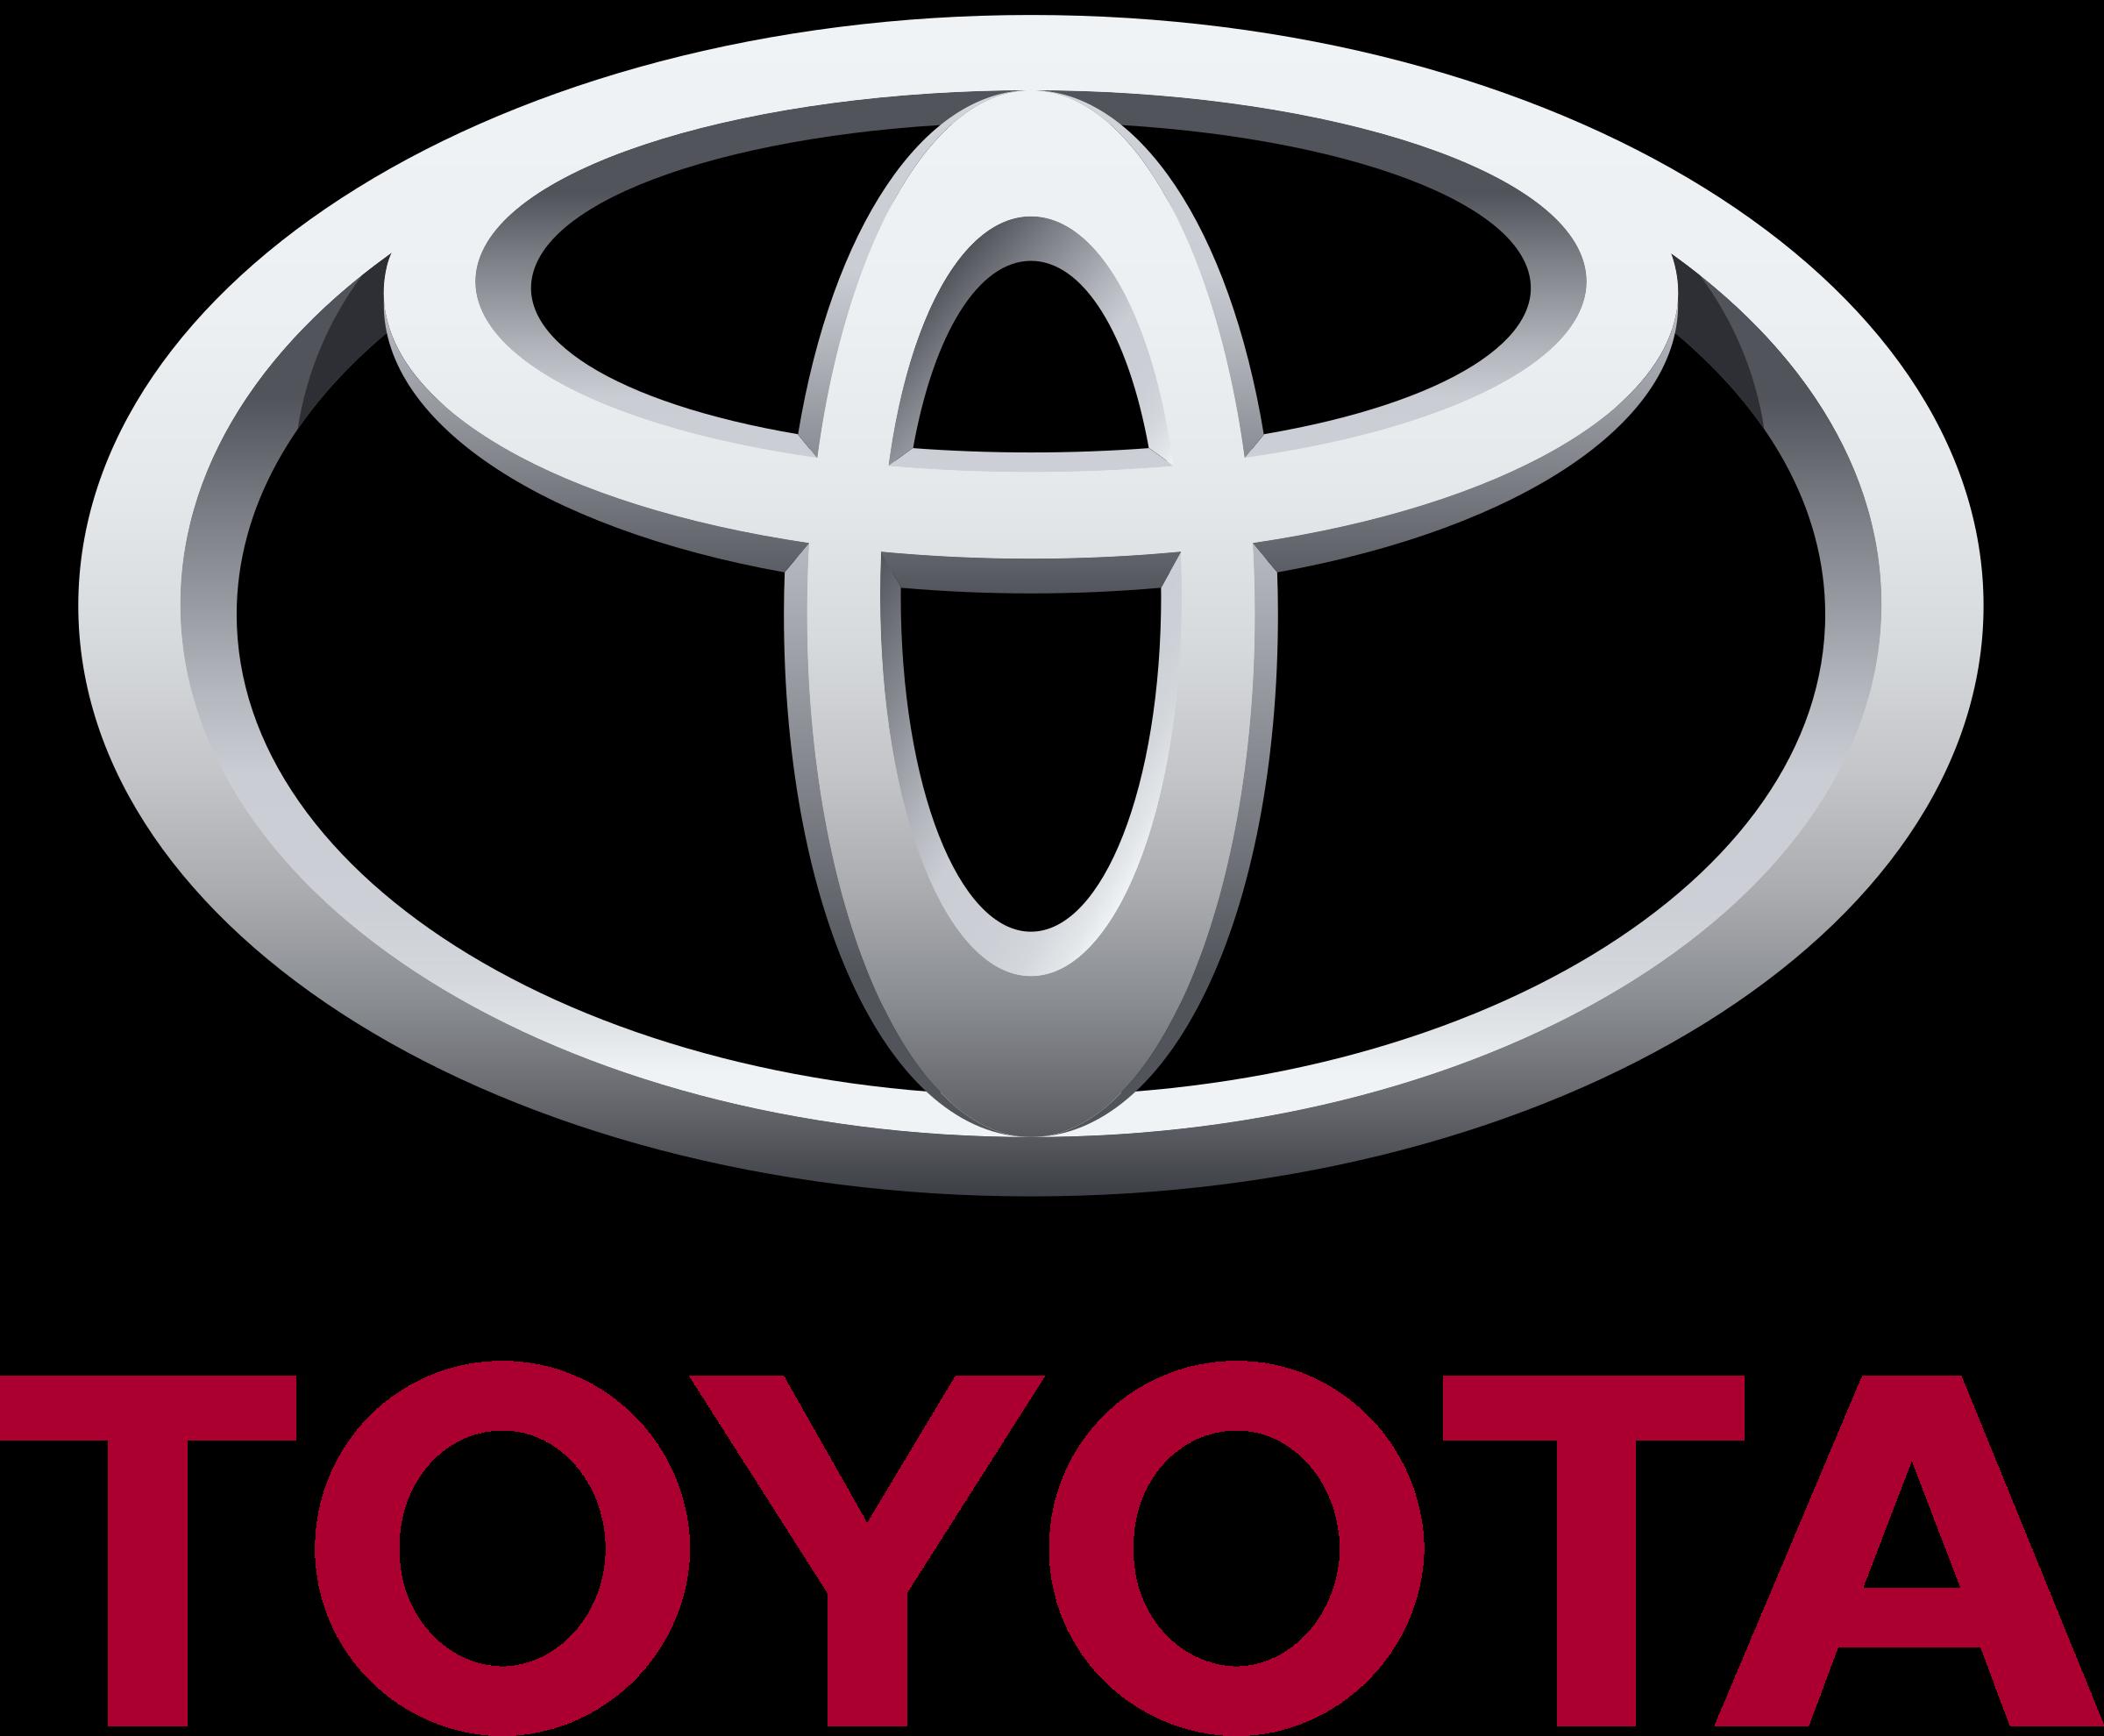 Toyota Logo PNG Transparent & SVG Vector - Freebie Supply ...